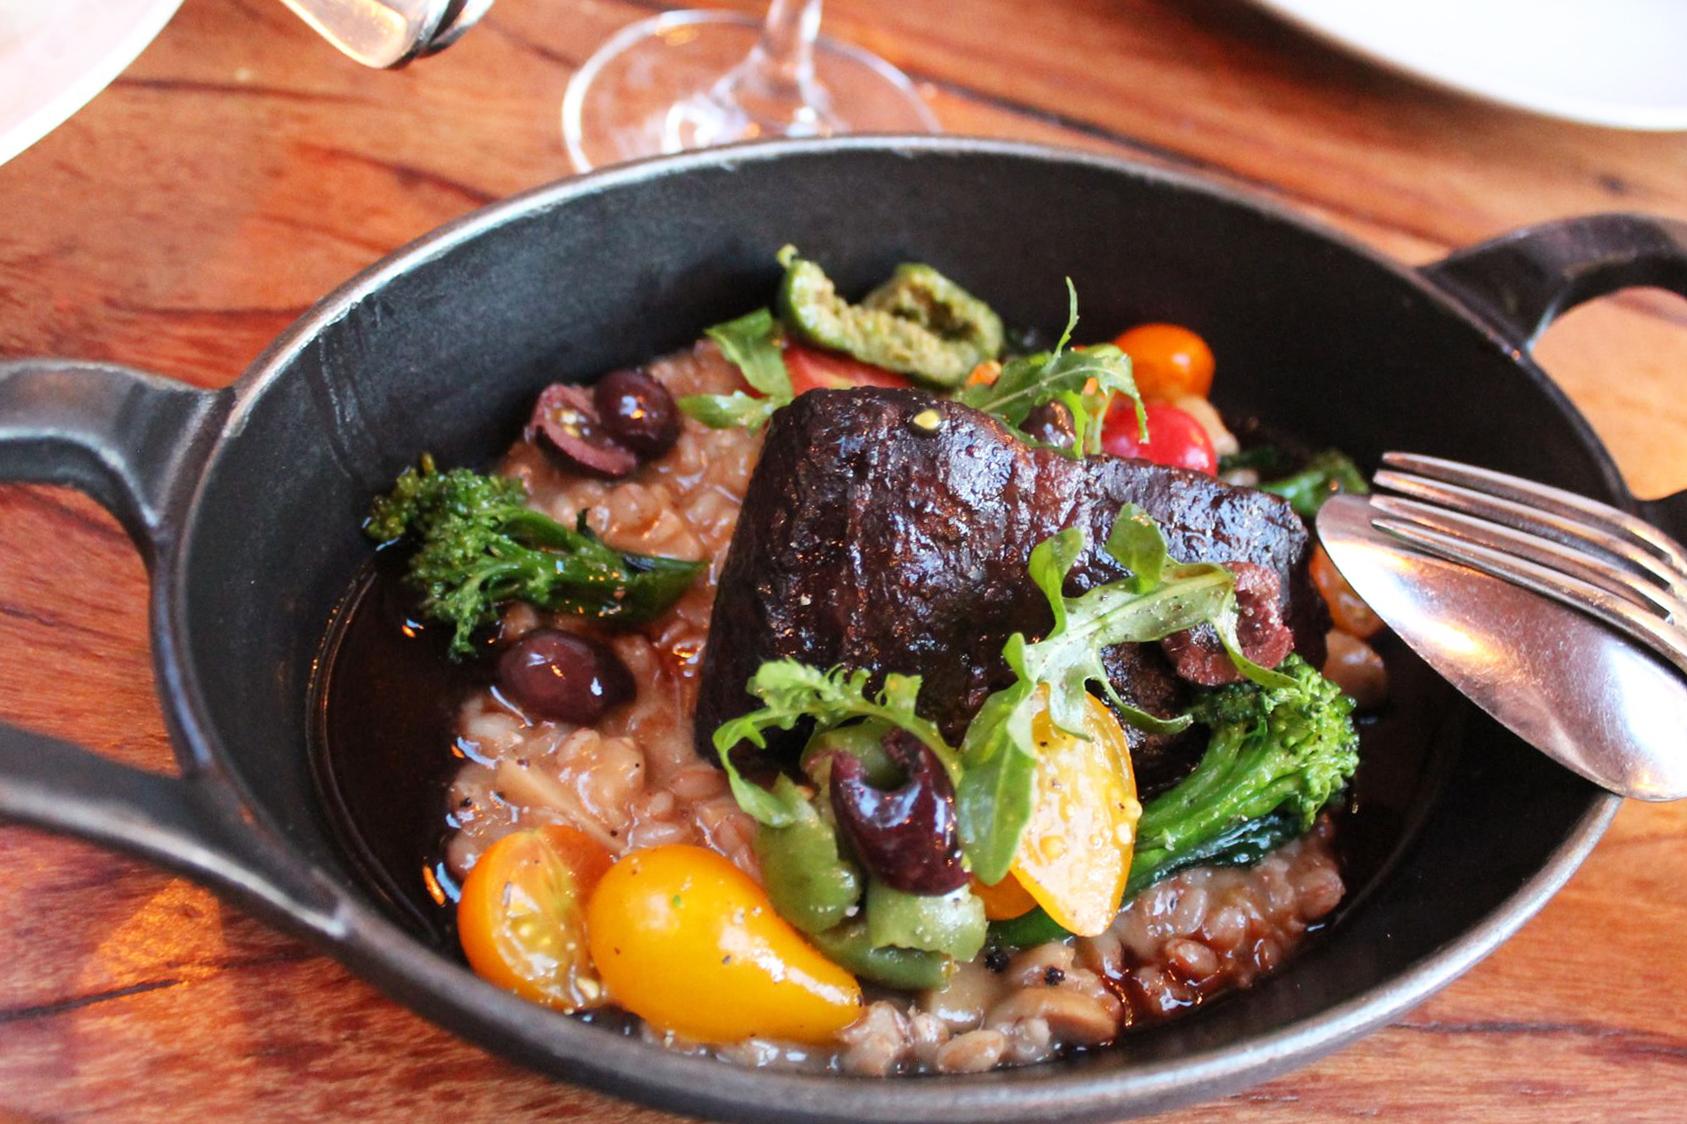 Red Wine-Braised Beef Short Rib   porcini mushroom-farro risotto, tomatoes, grilled broccoli